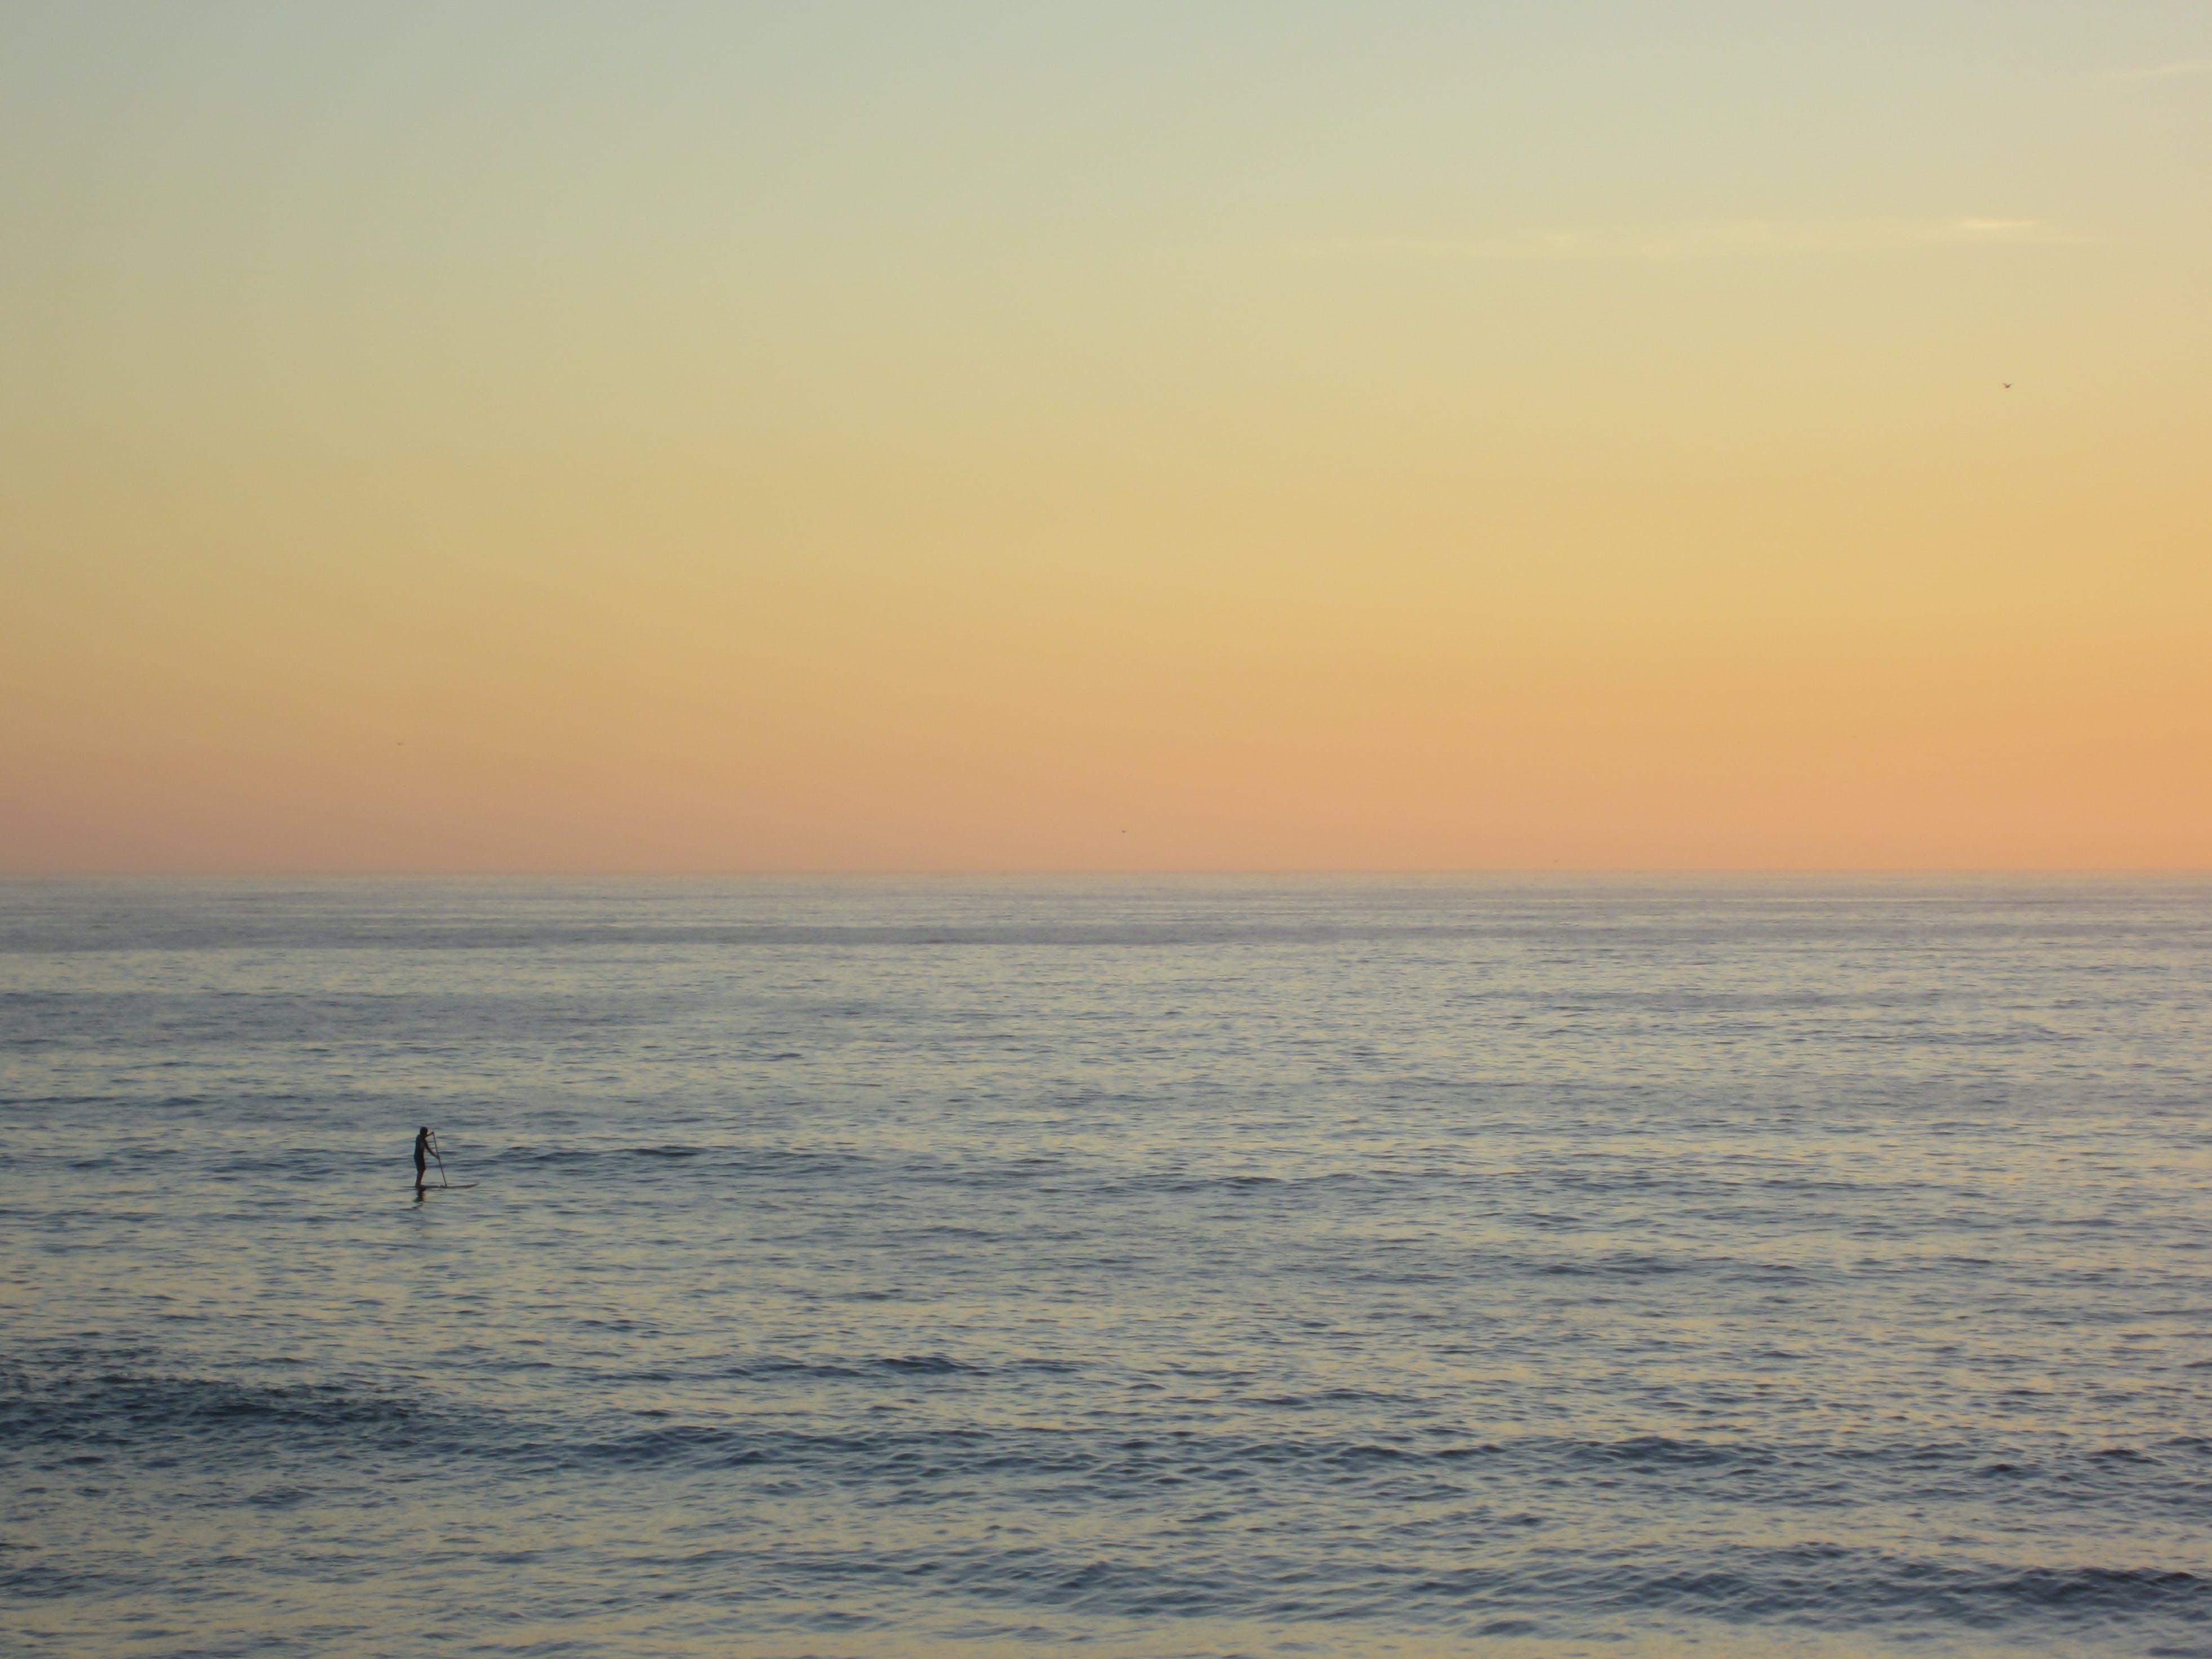 ocean, sea, sky